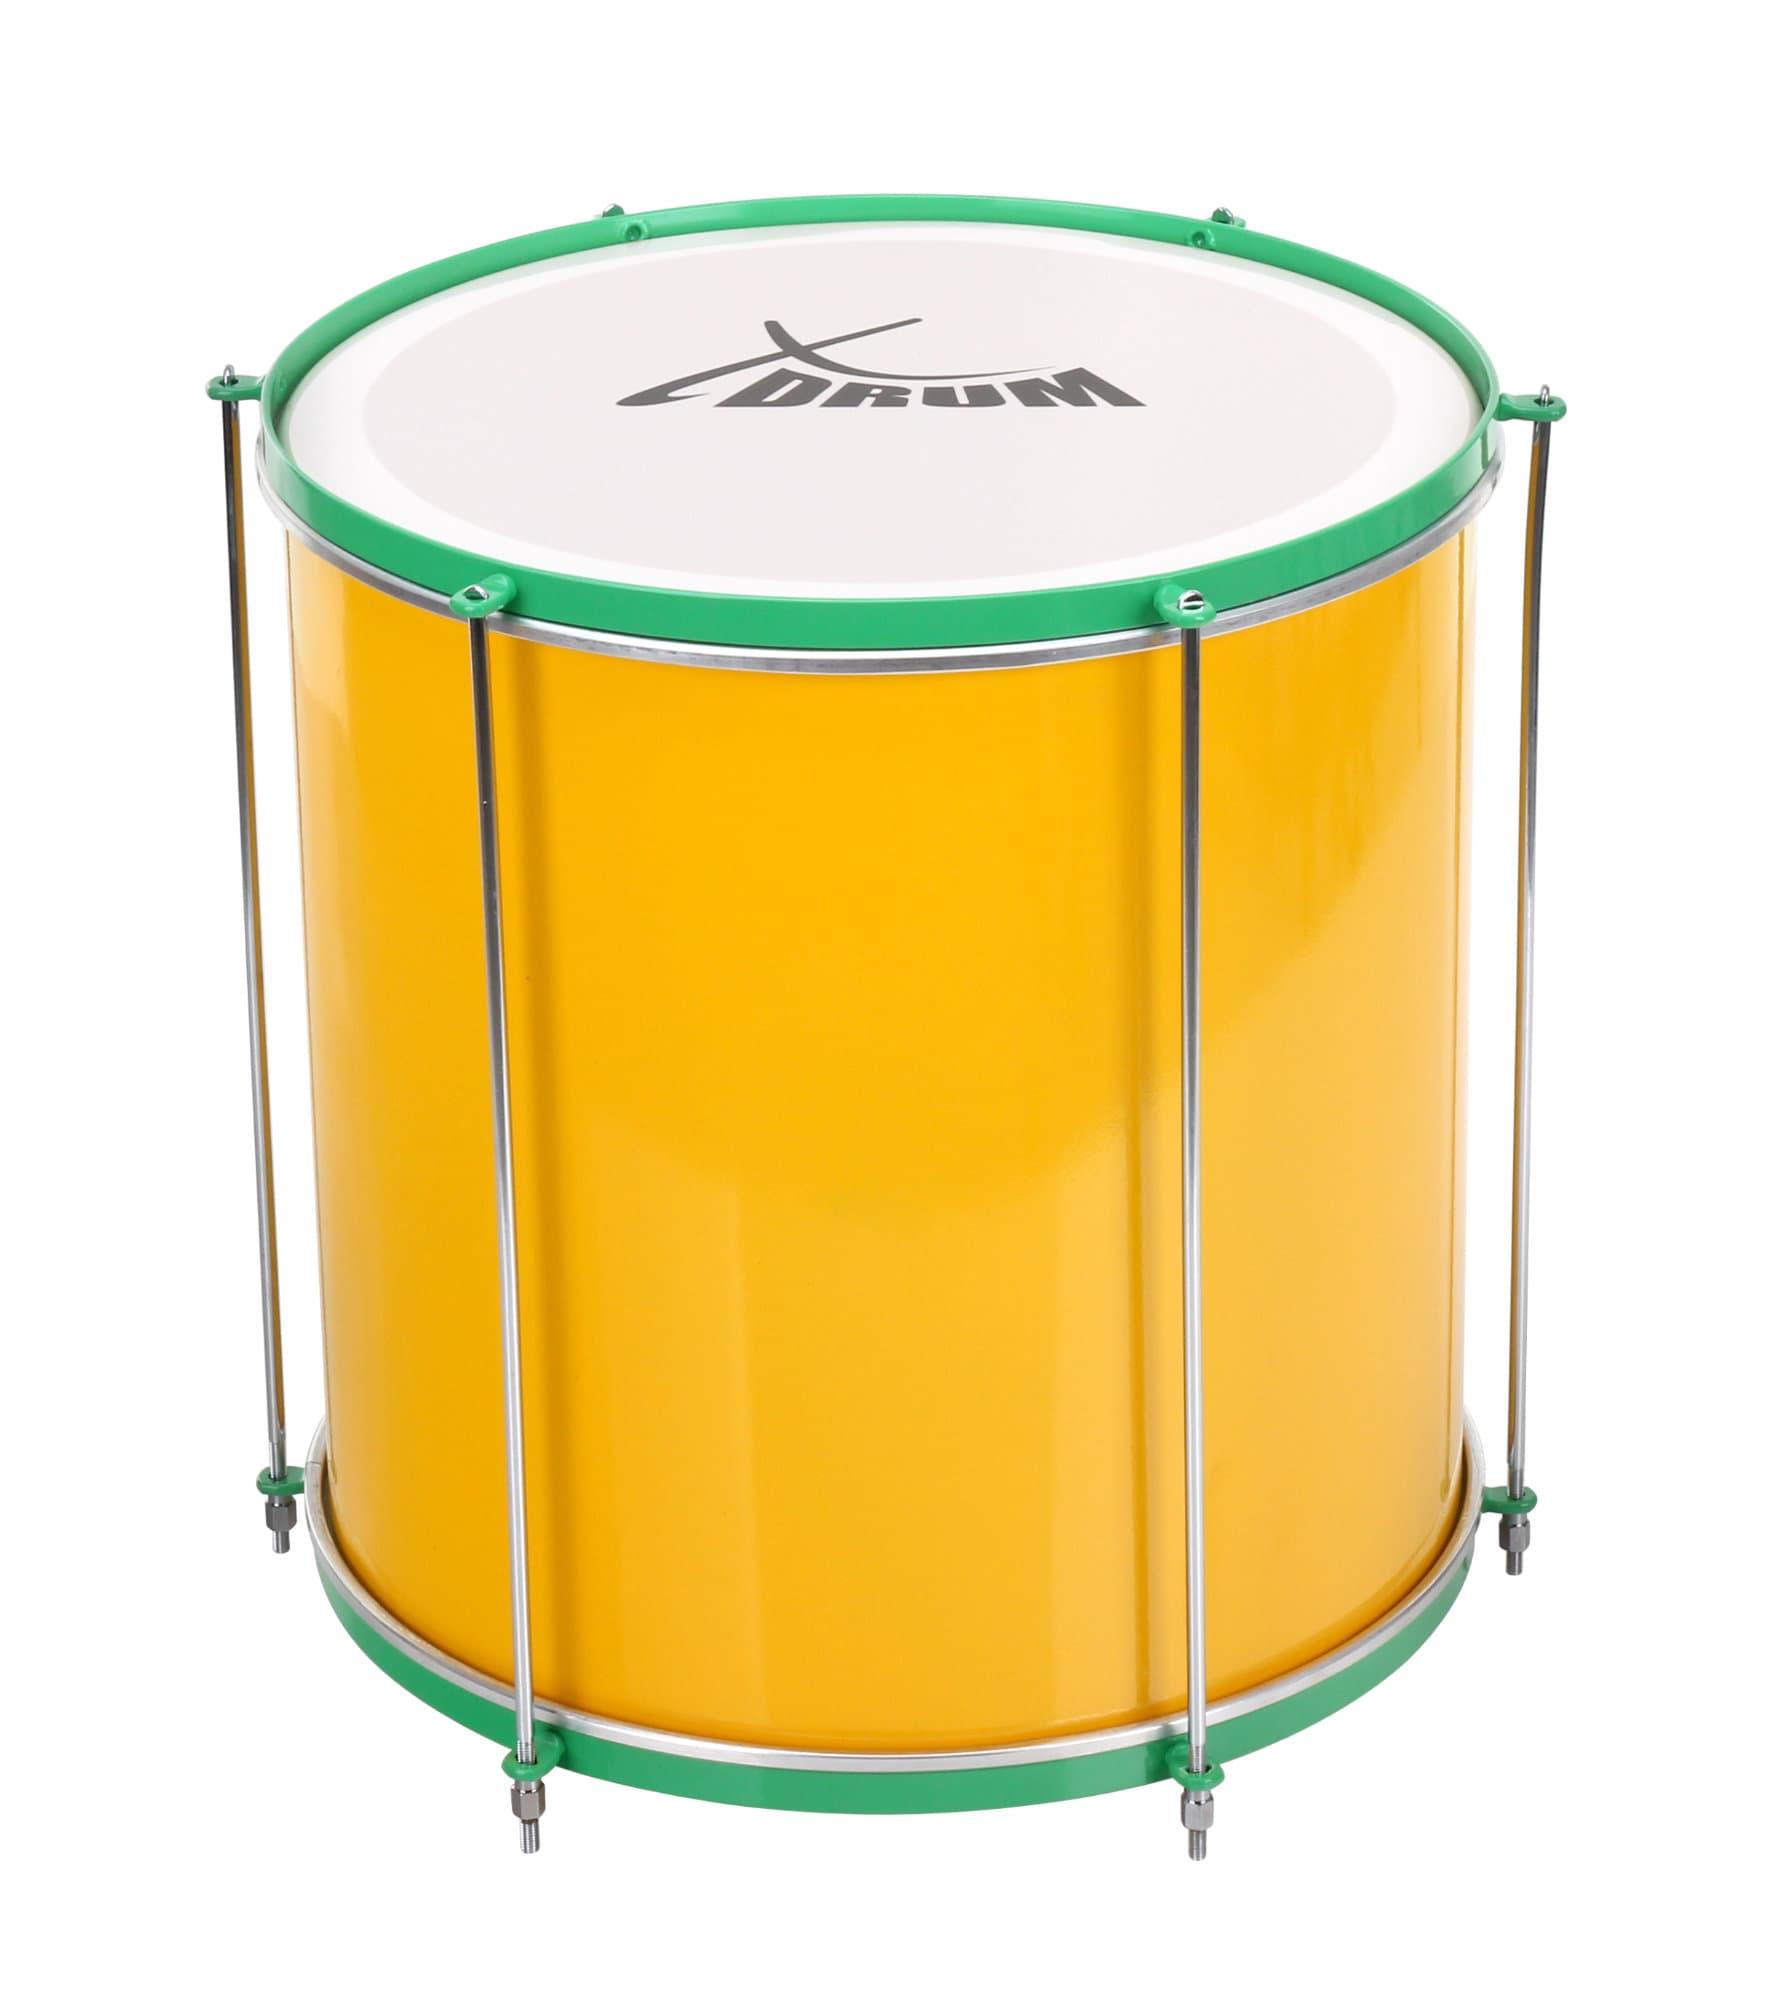 Marching - XDrum SSD 1616 Surdo Samba Trommel - Onlineshop Musikhaus Kirstein